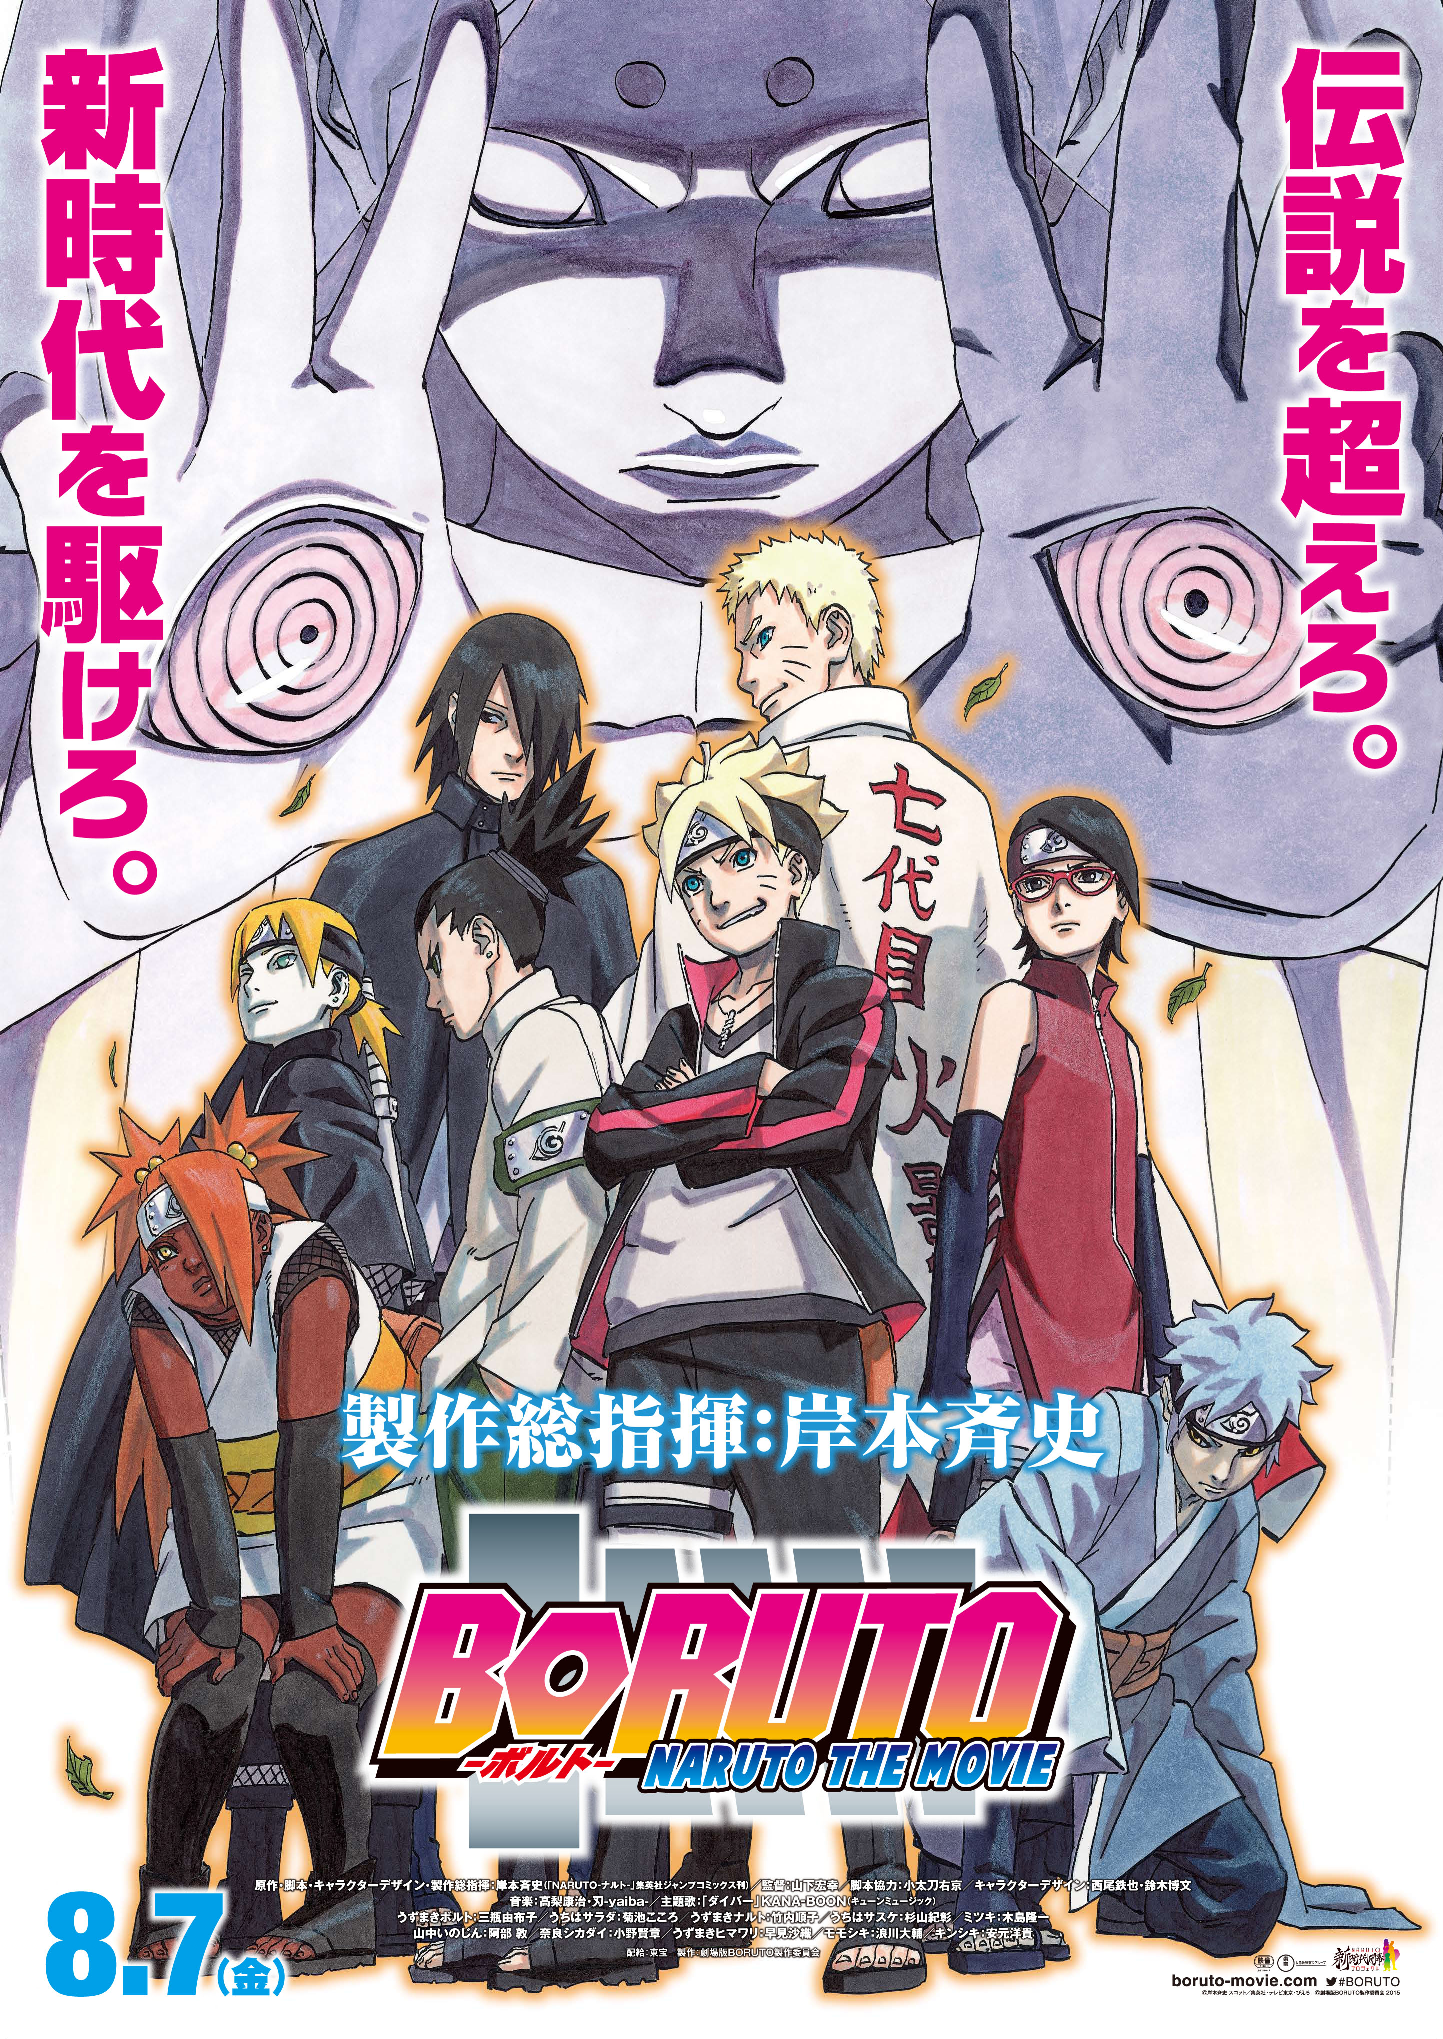 Countdown-For-Naruto-Next-Generation-Revealed-on-Shounen-Jump-Website 2